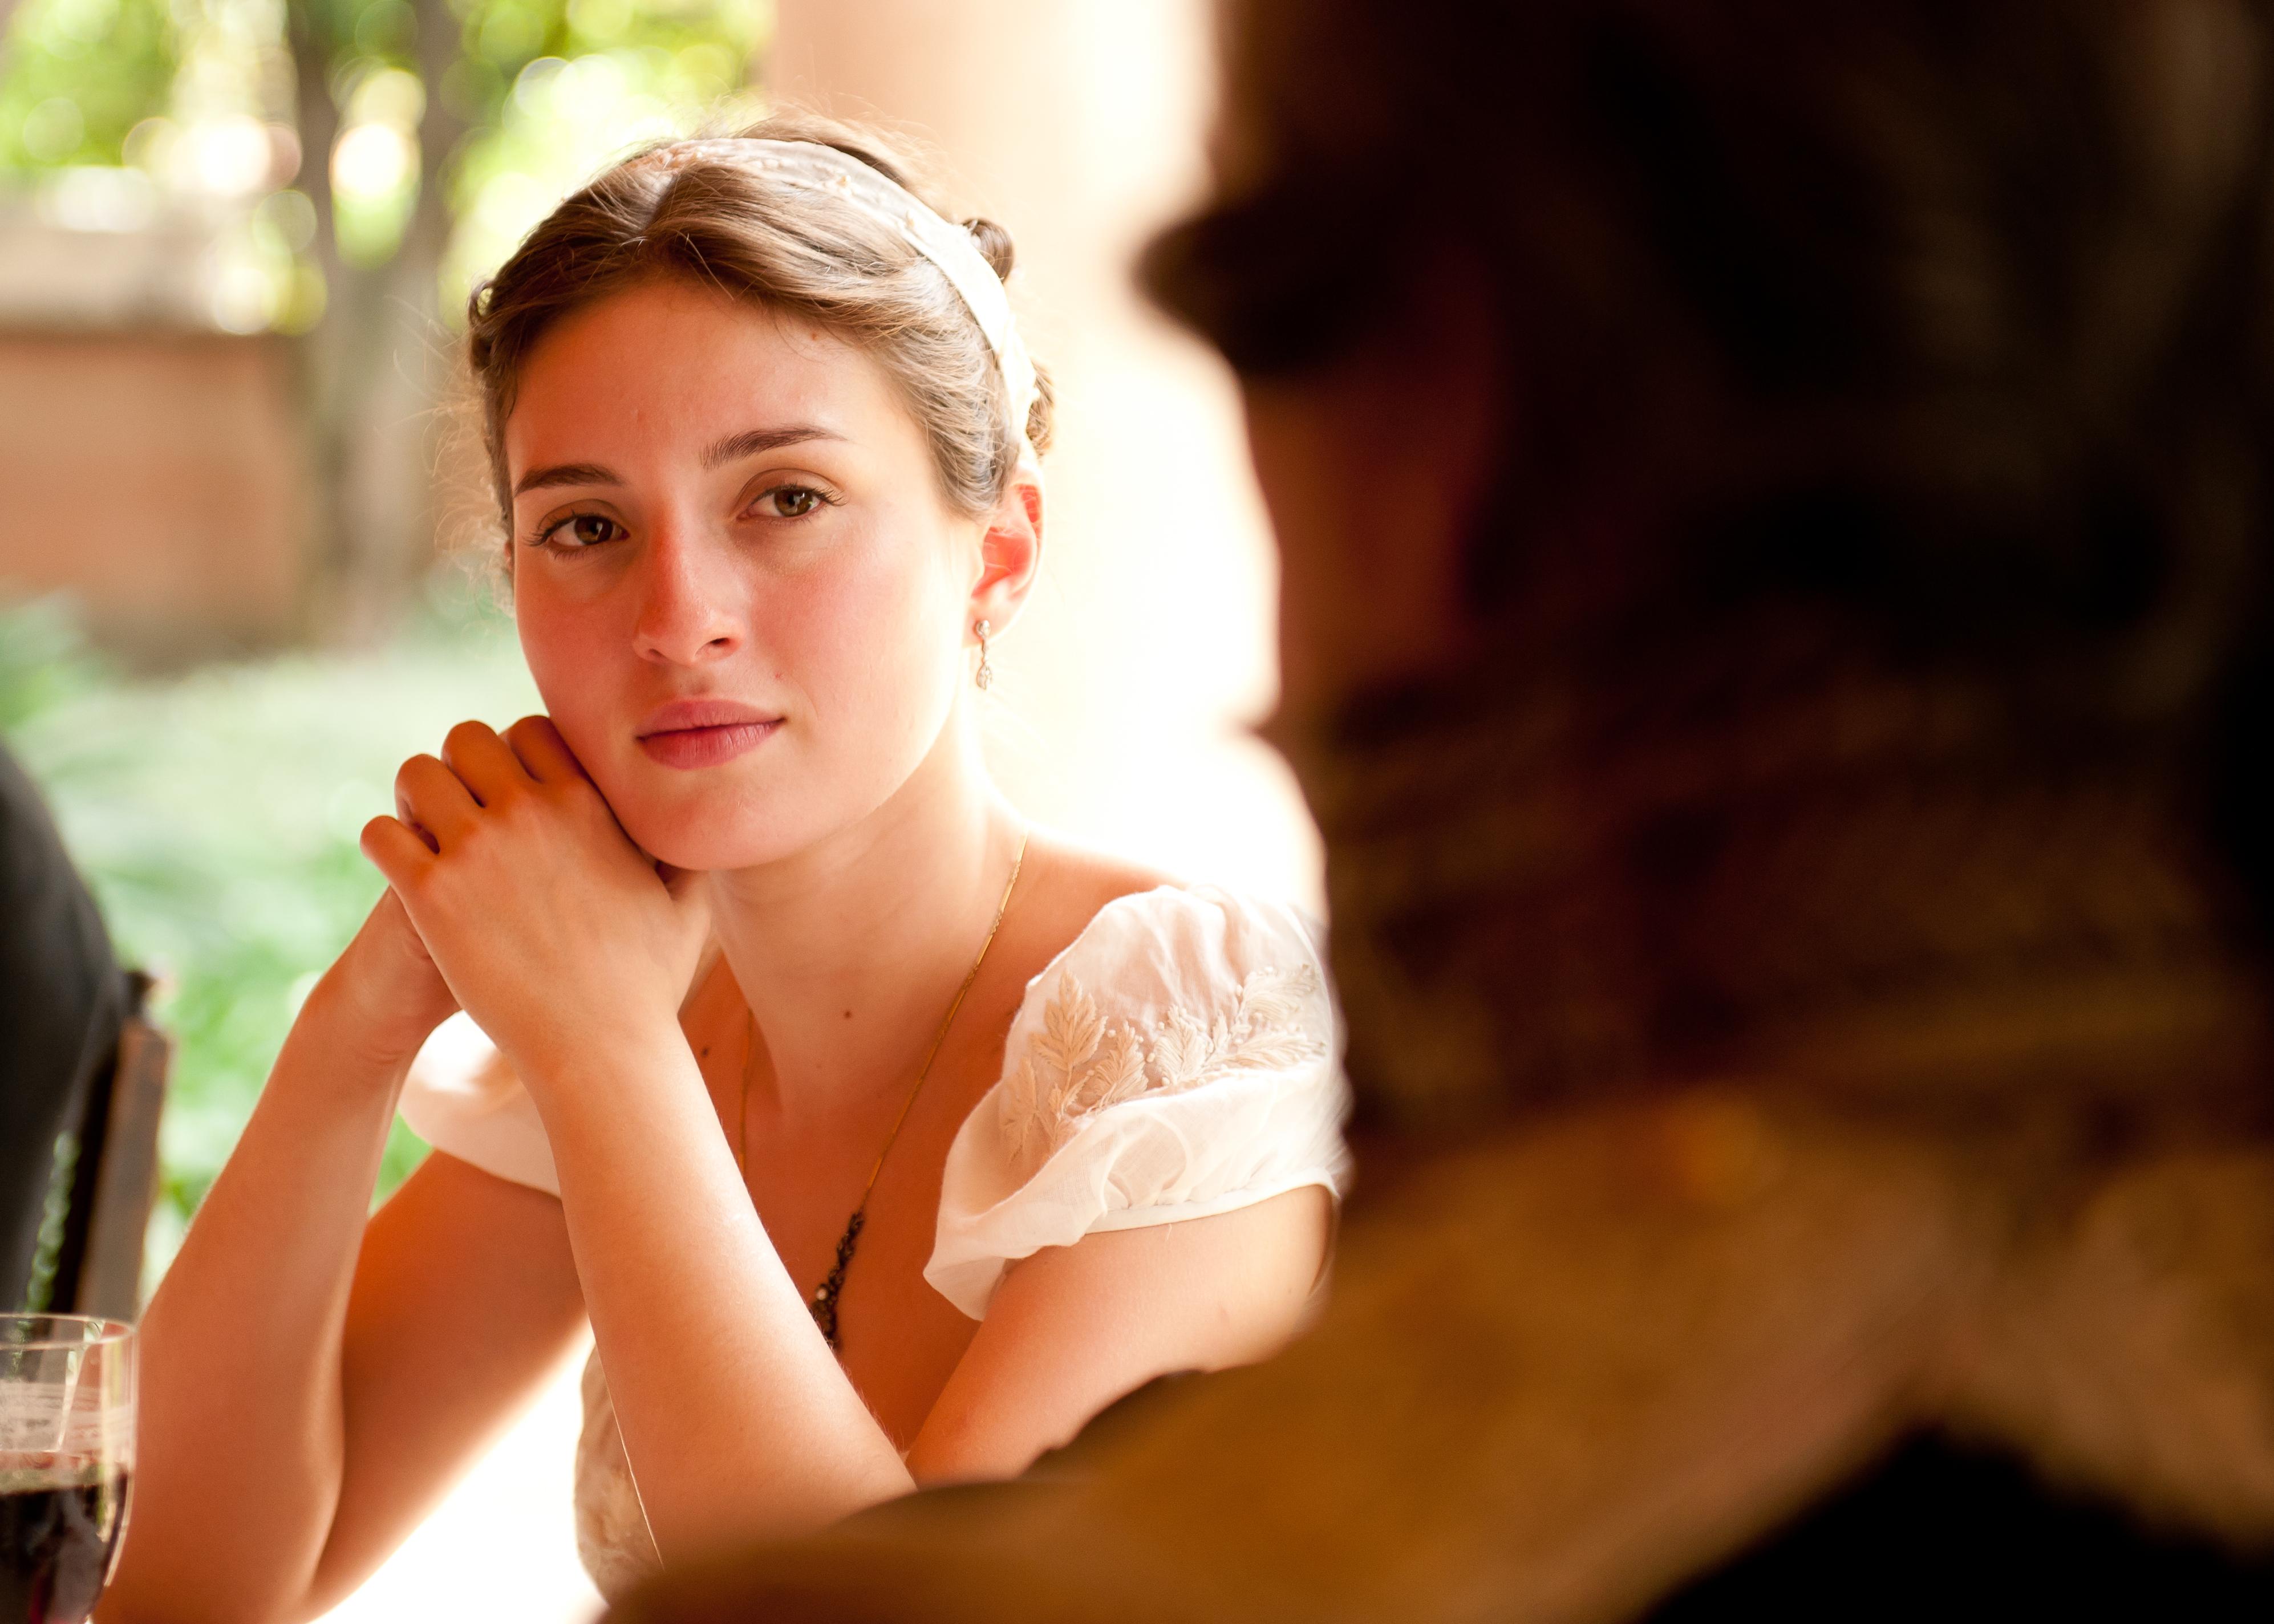 -maria-valverde-speaks-on-edgar-ramirez-simon-bolivar-the-oscars jpgSimon Bolivar Wife